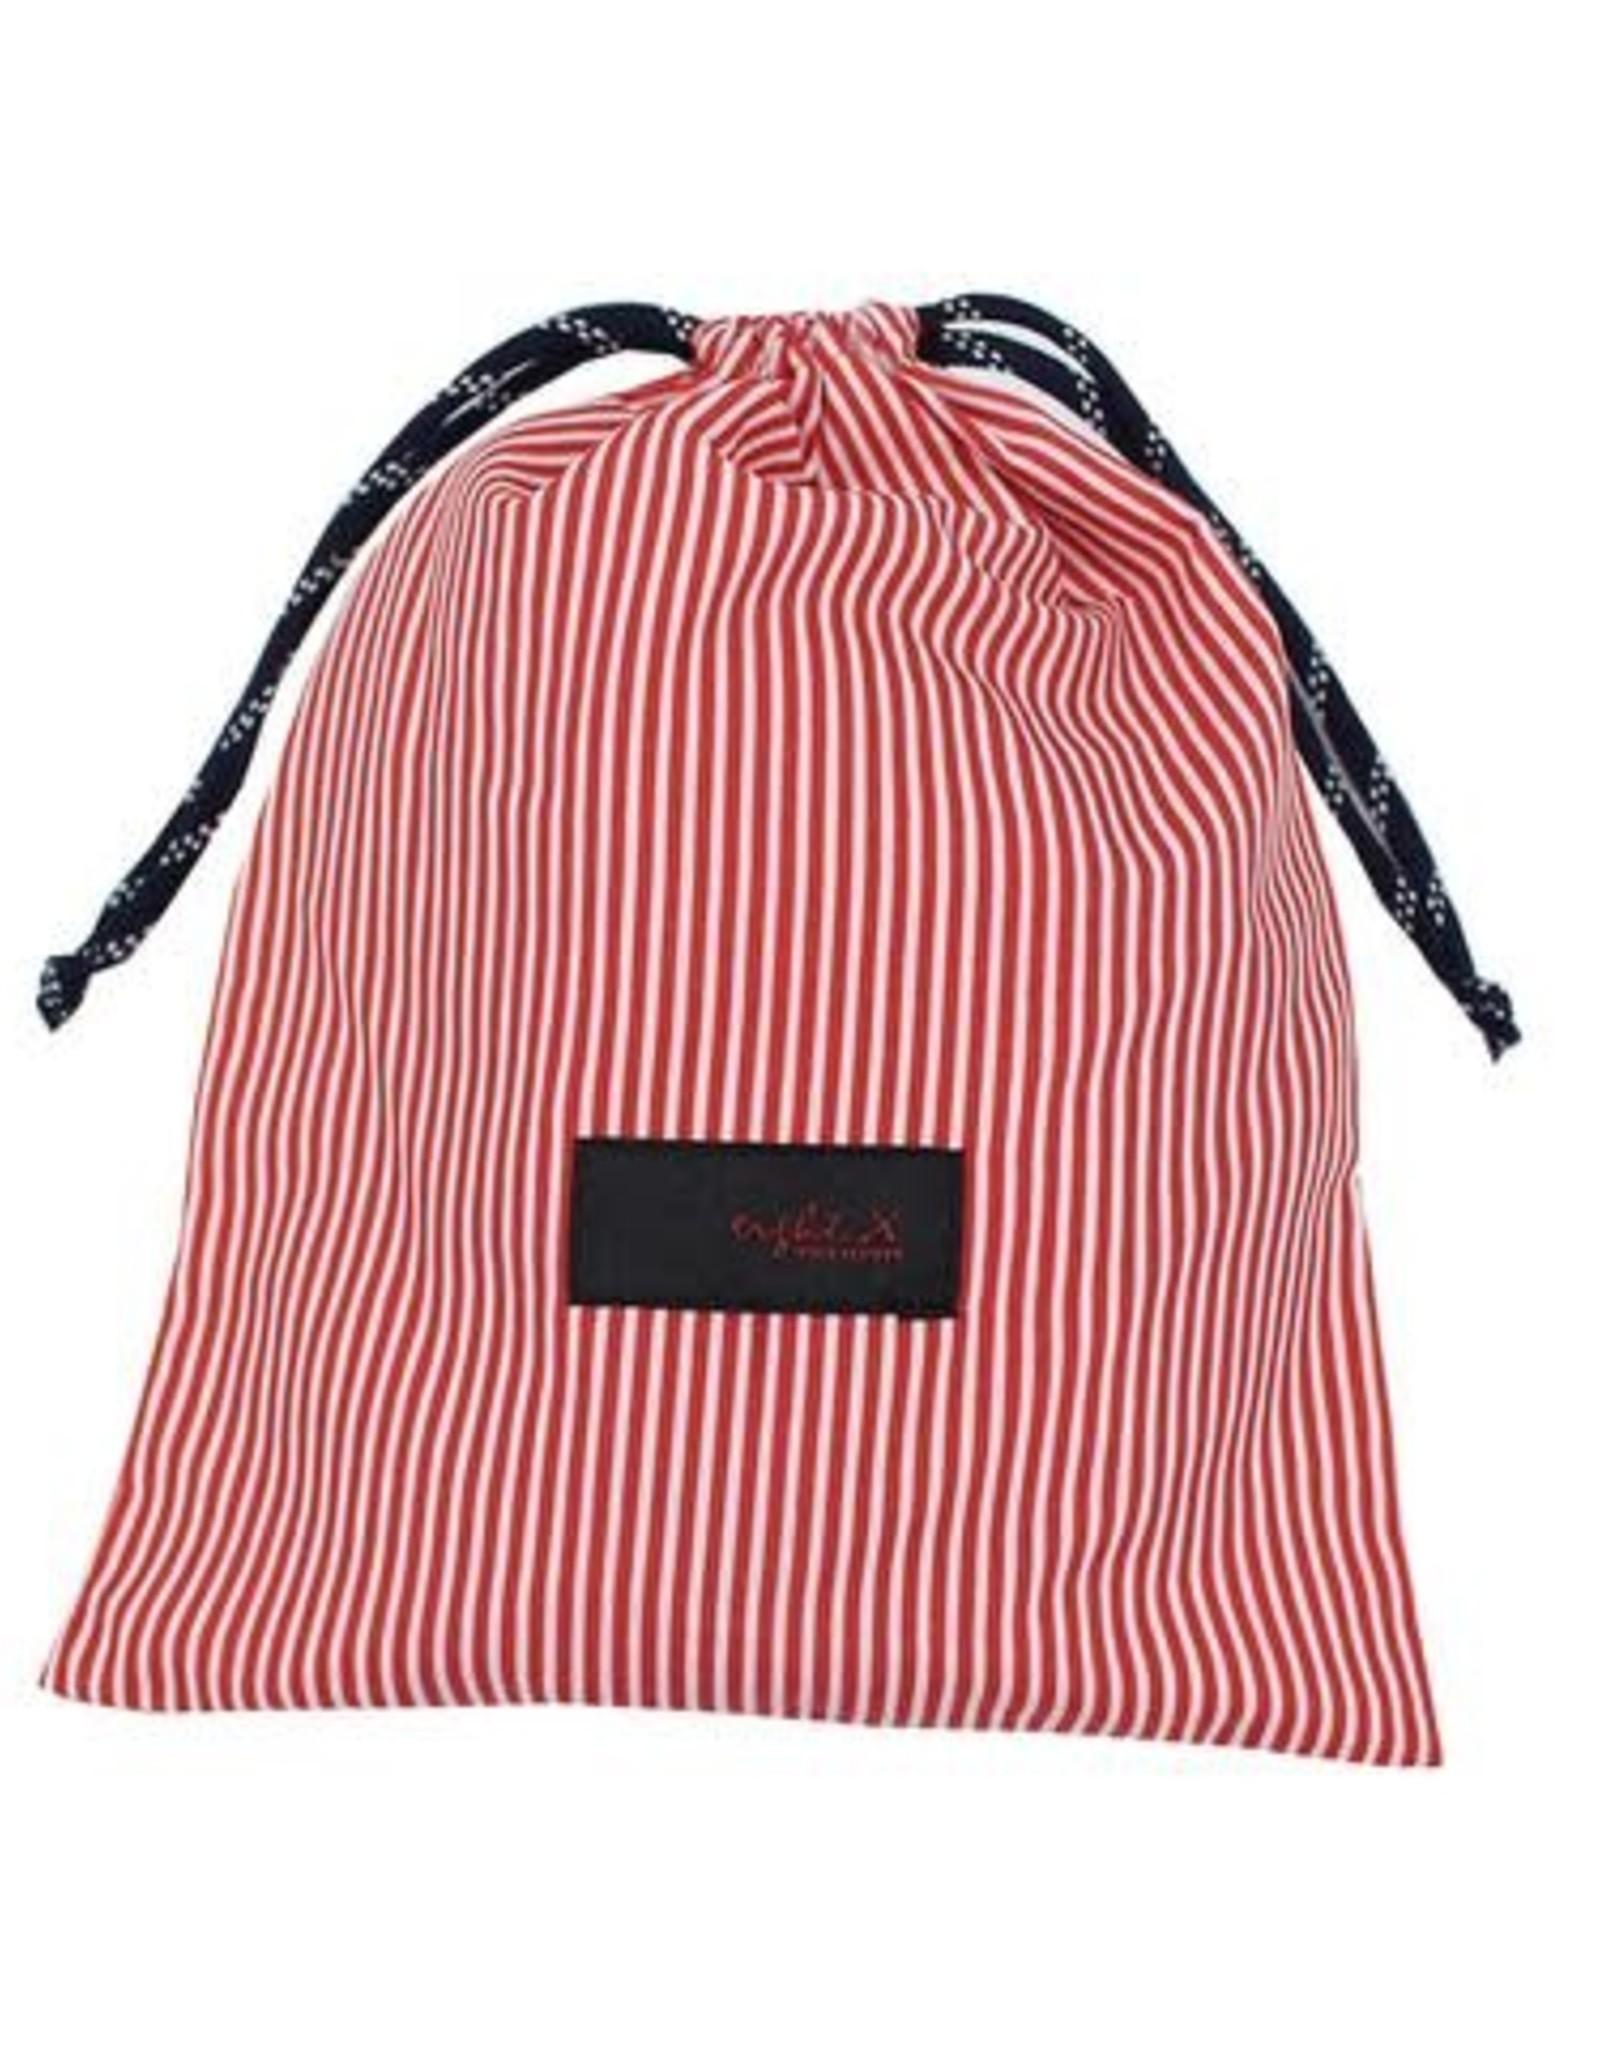 Eight X Red Stripe Swim Trunk